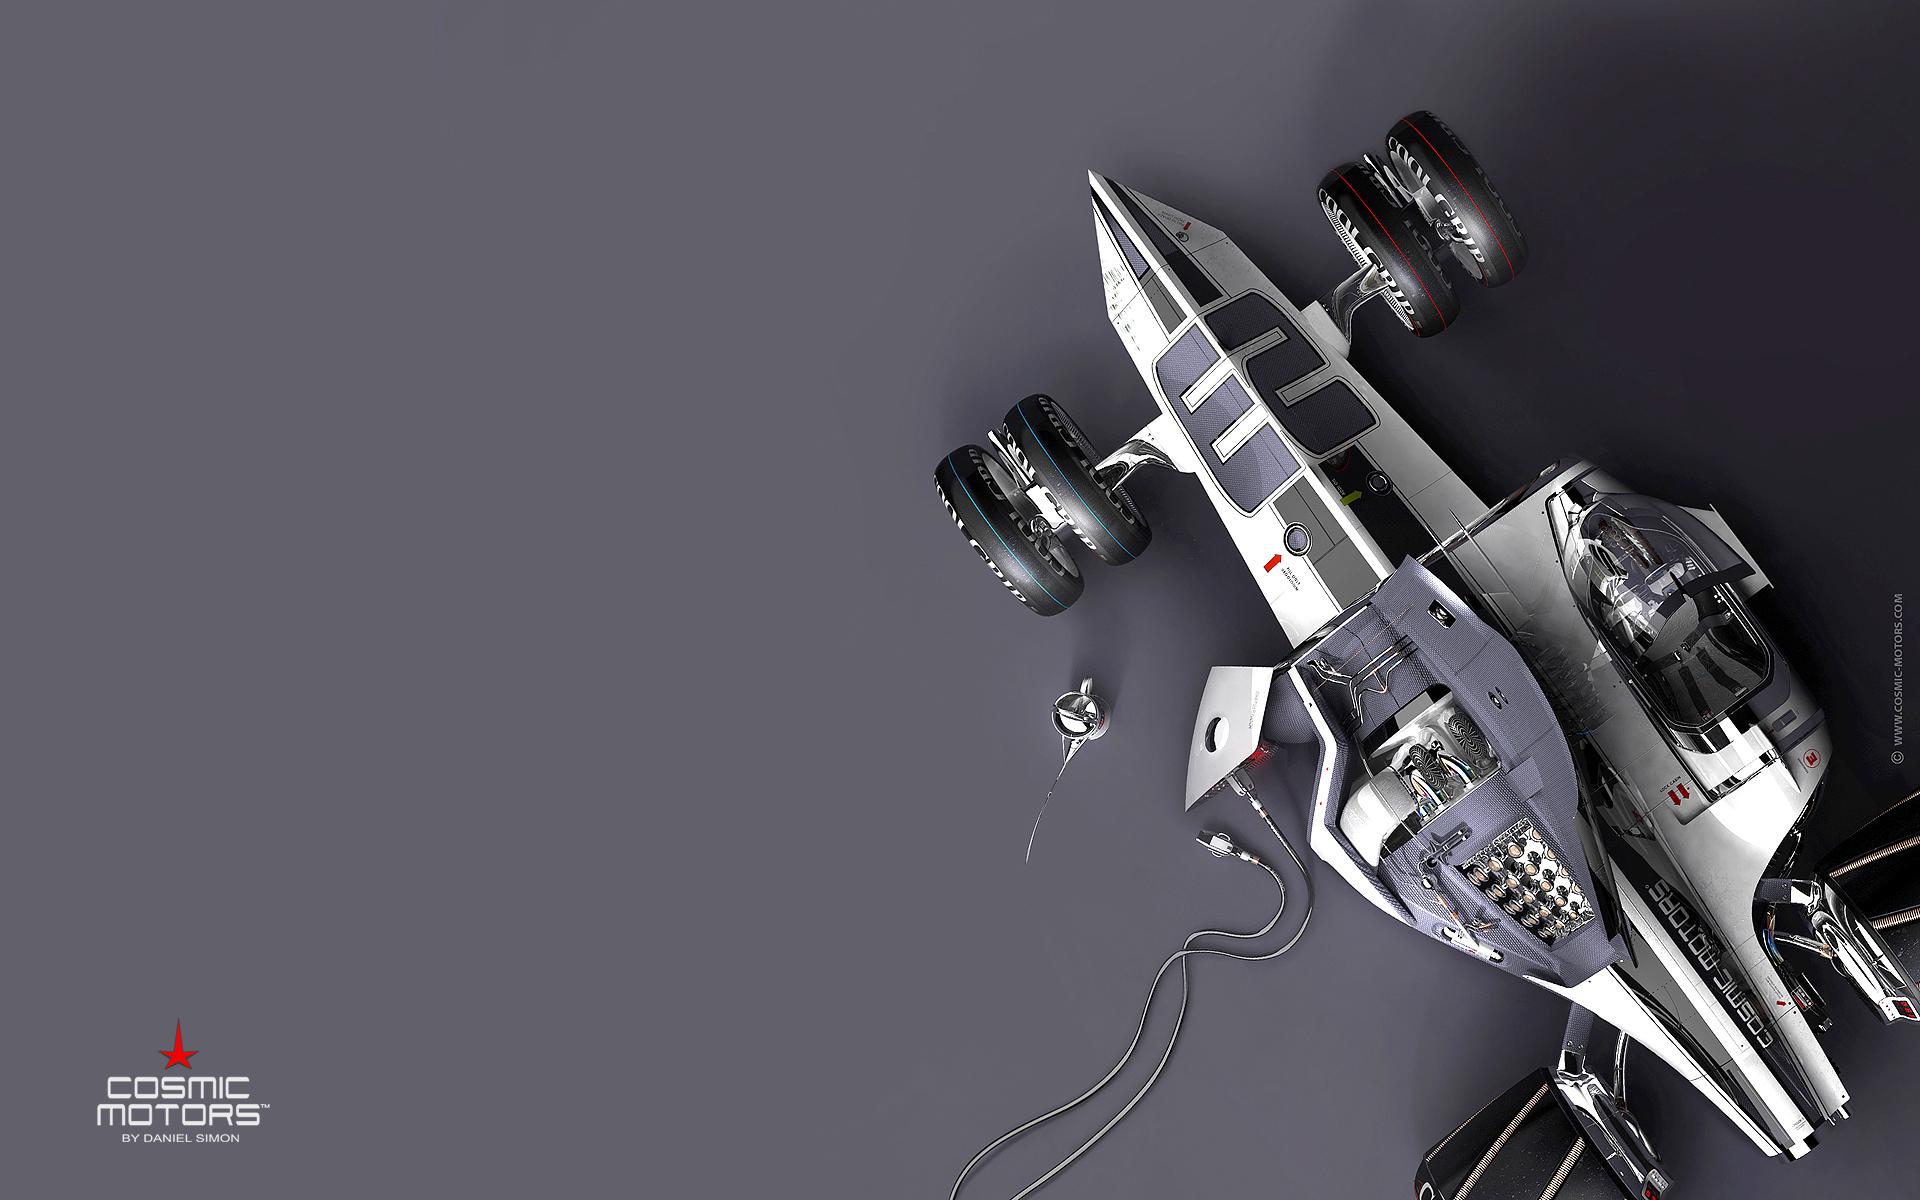 Wallpaper : Cosmic Motors, formula, futuristic, CGI, simple